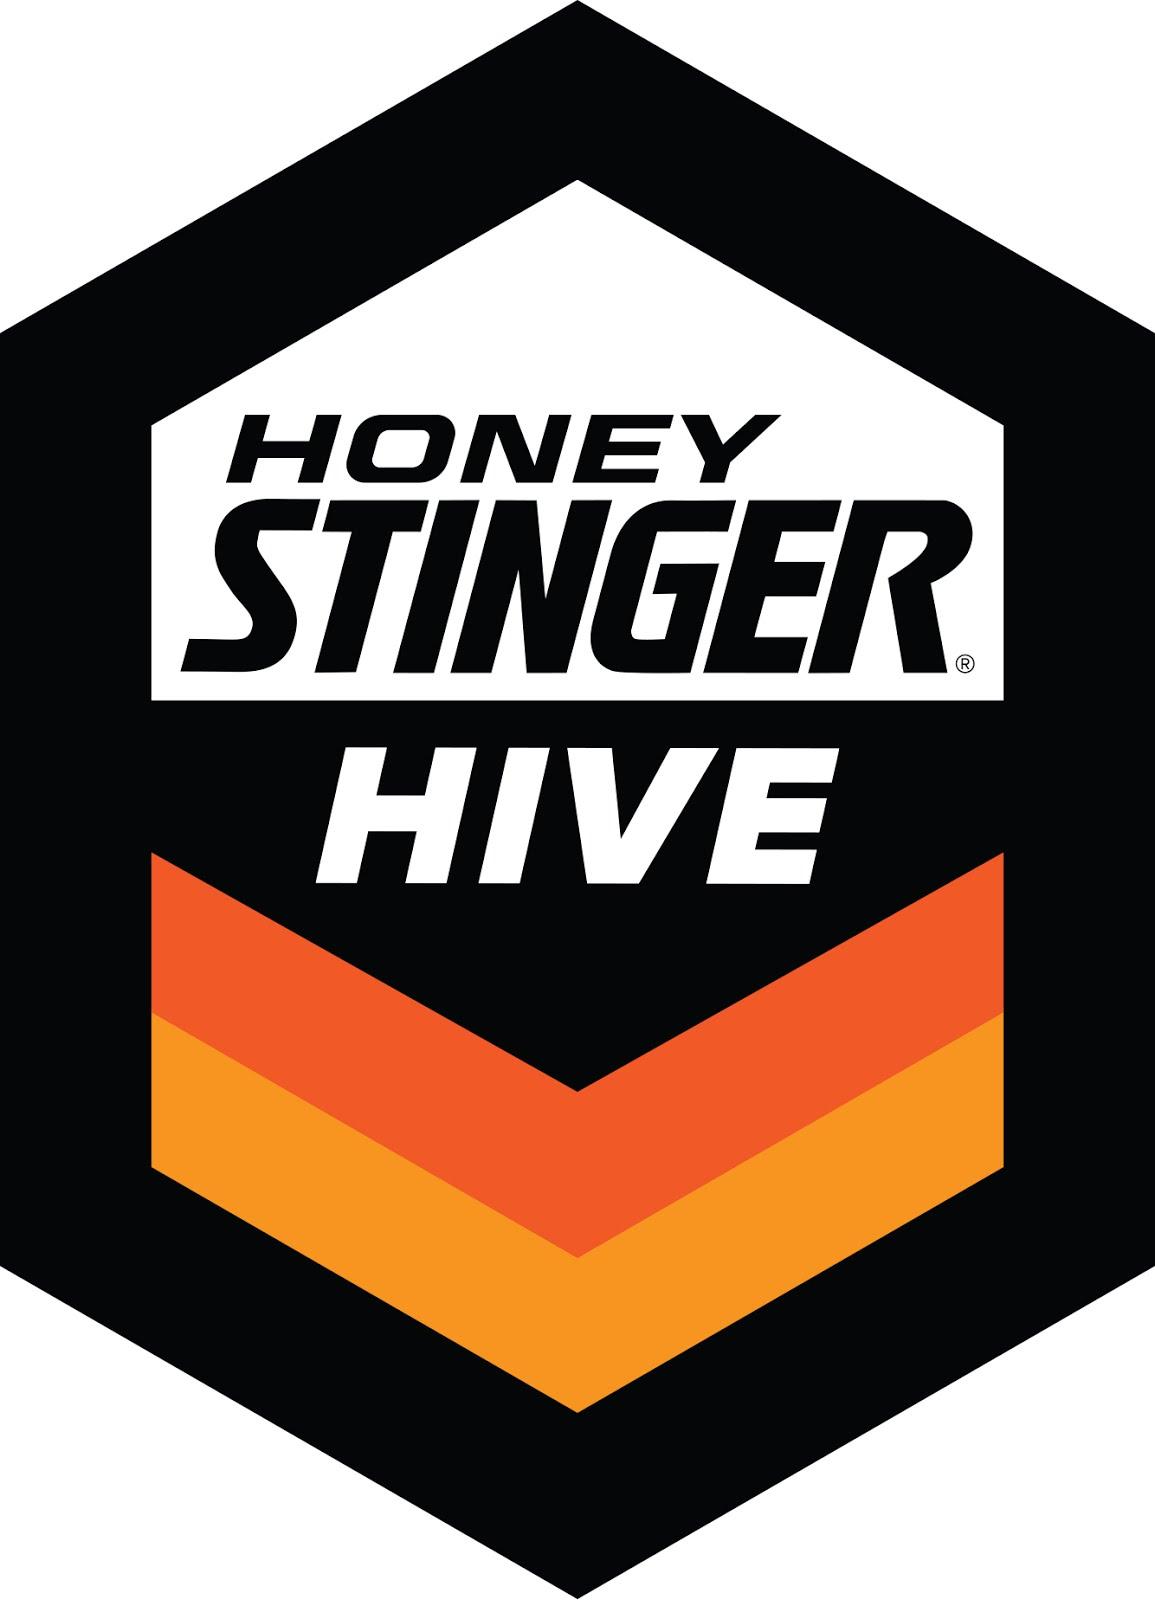 Honeystinger Hive